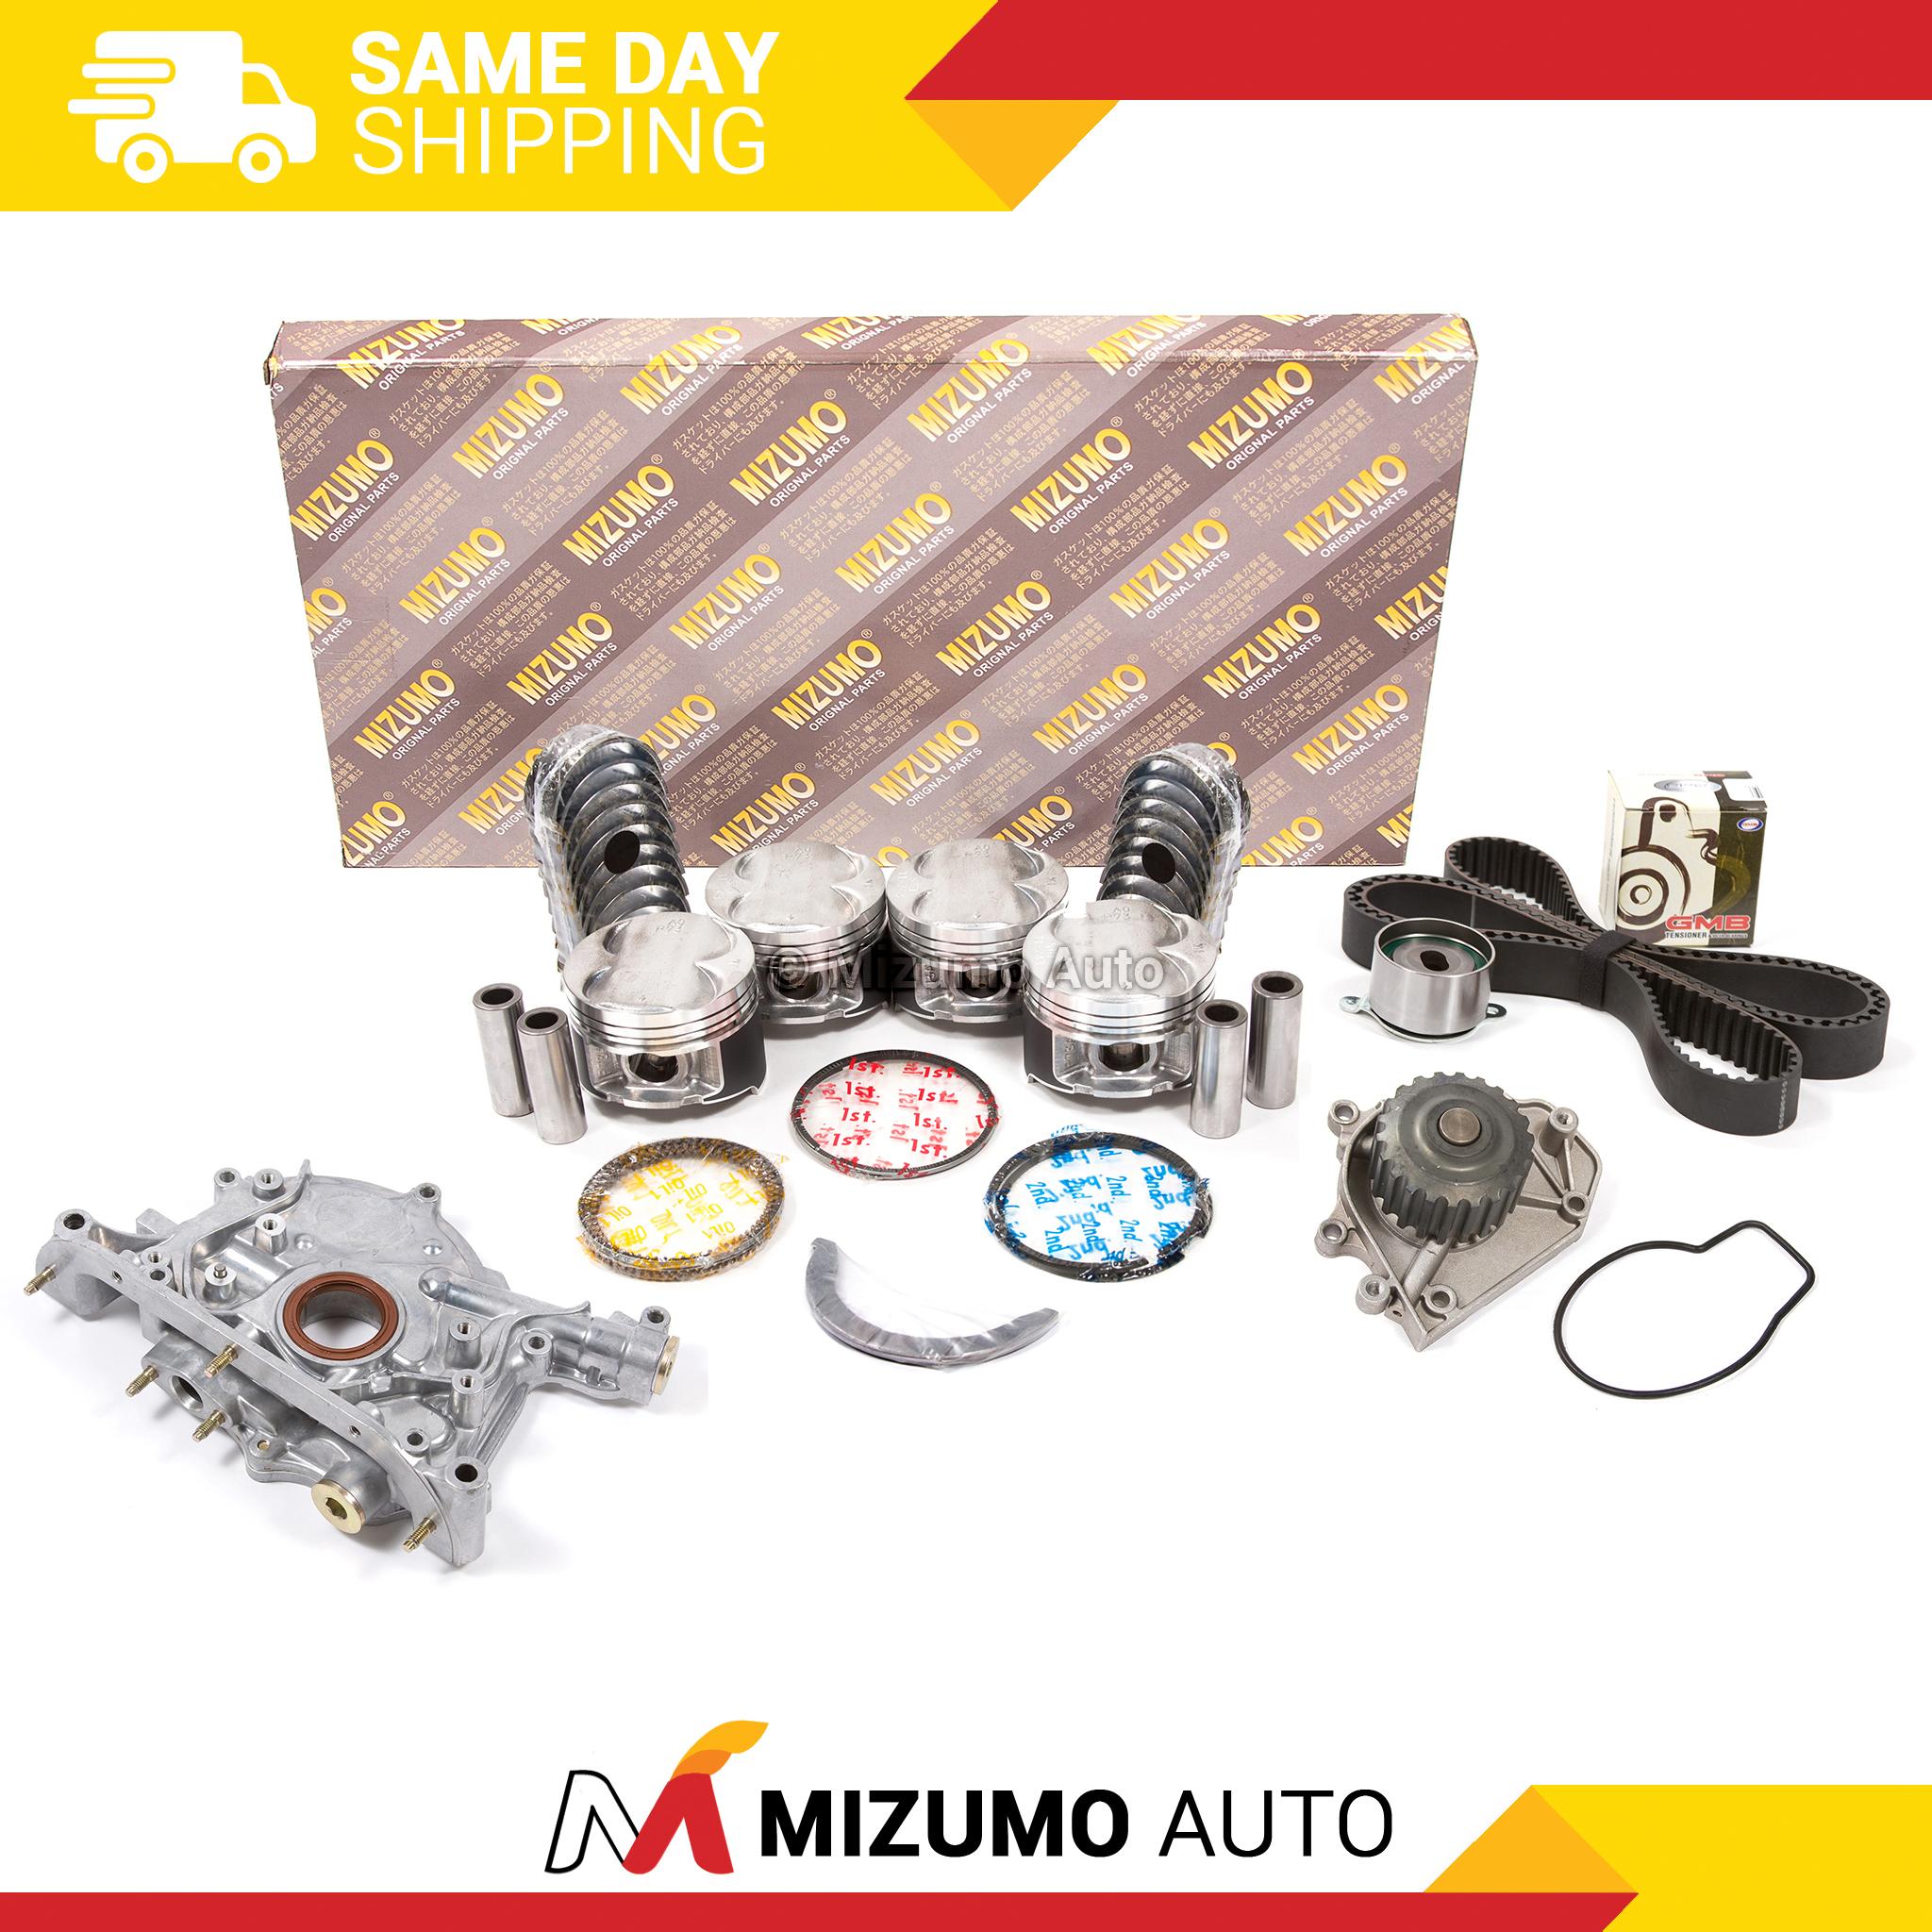 Engine Rebuild Kit Fit 97-01 Acura Integra Type-R VTEC 1